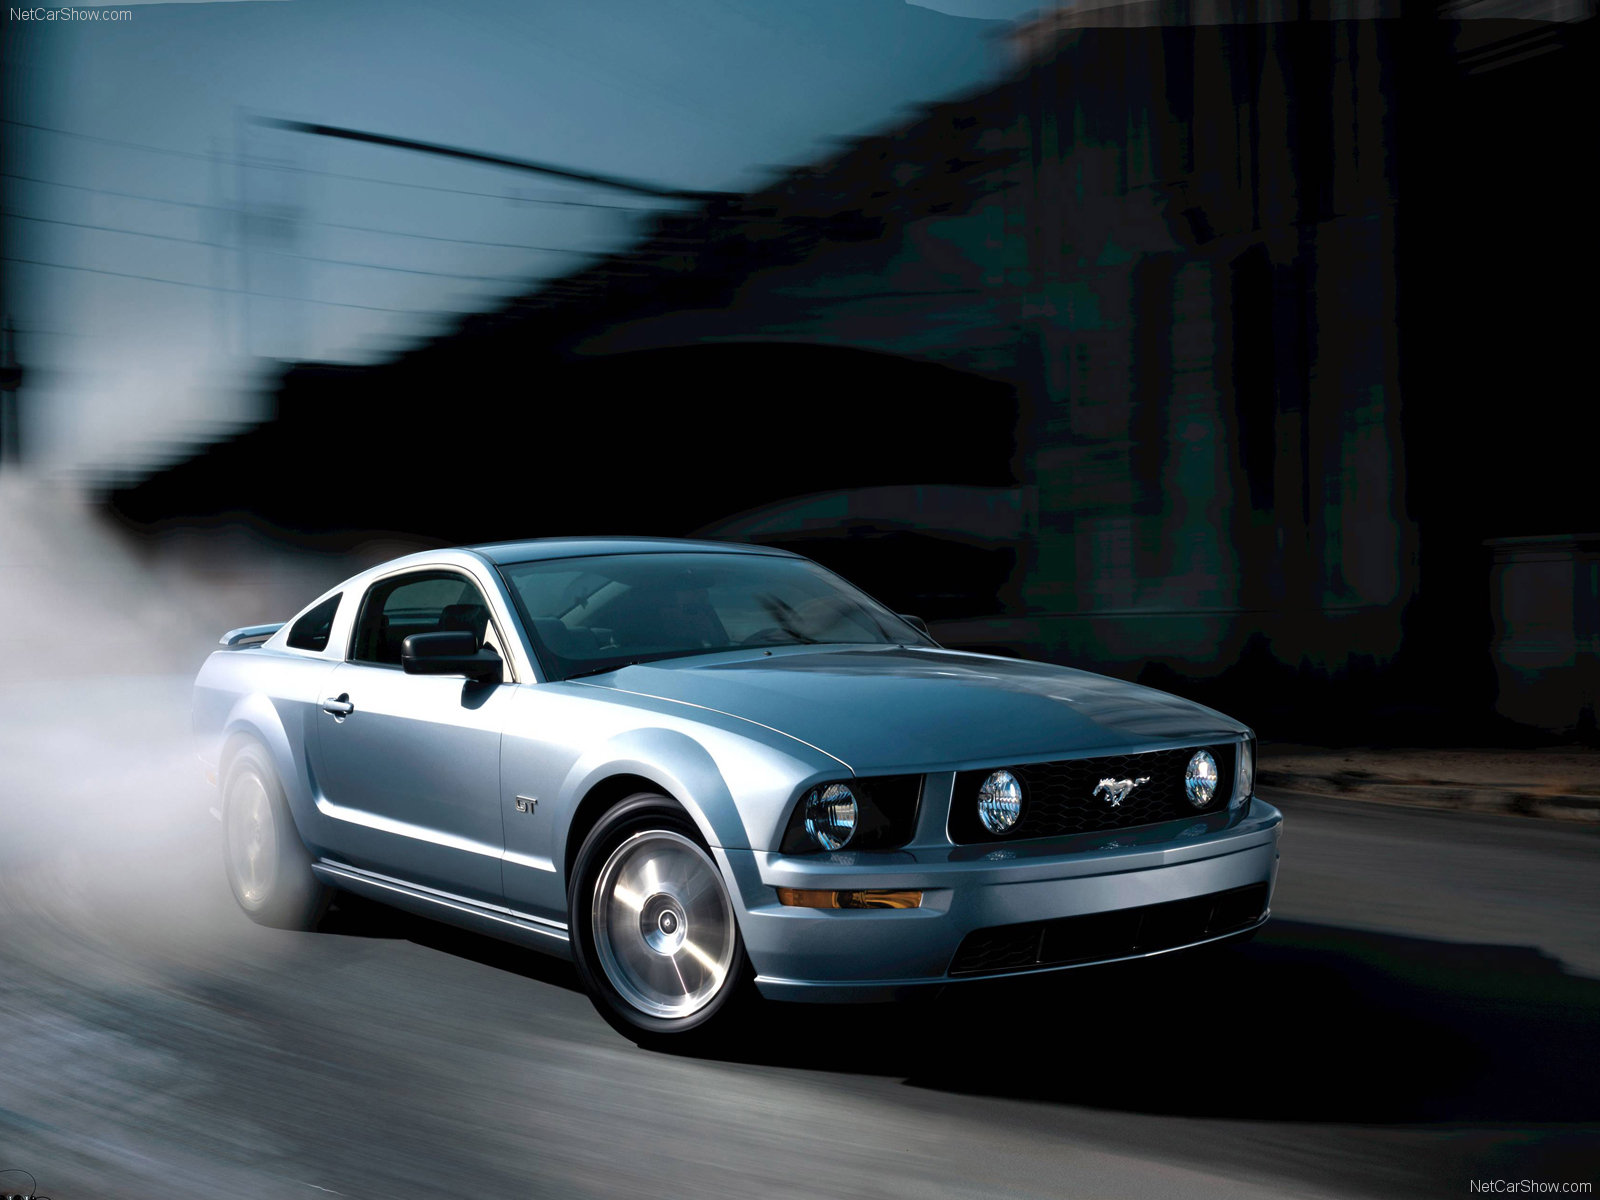 Ford Mustang HD Wallpaper Set 4 1600x1200